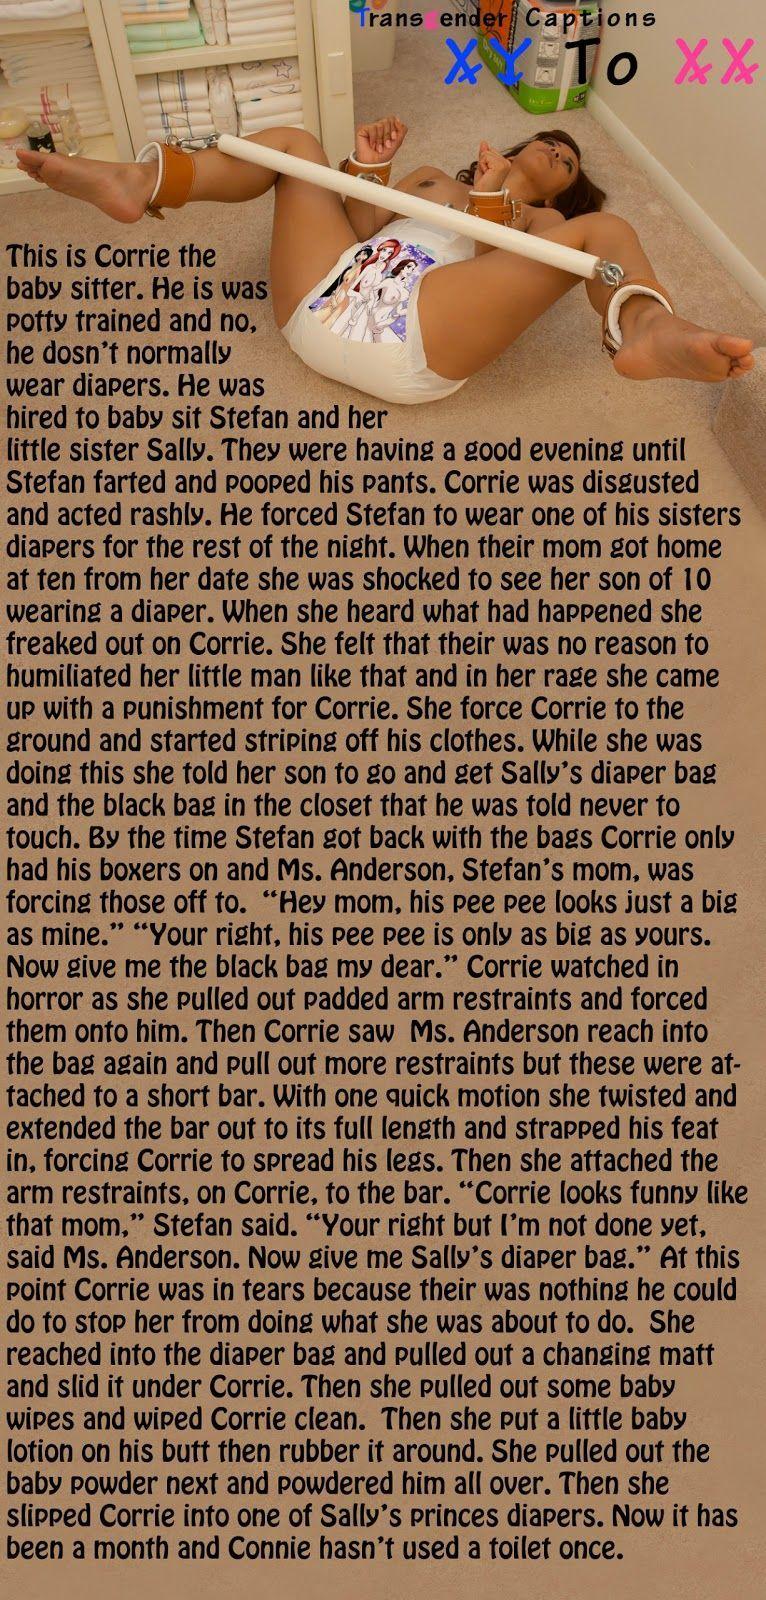 Stories forced baby bondage Rape, a